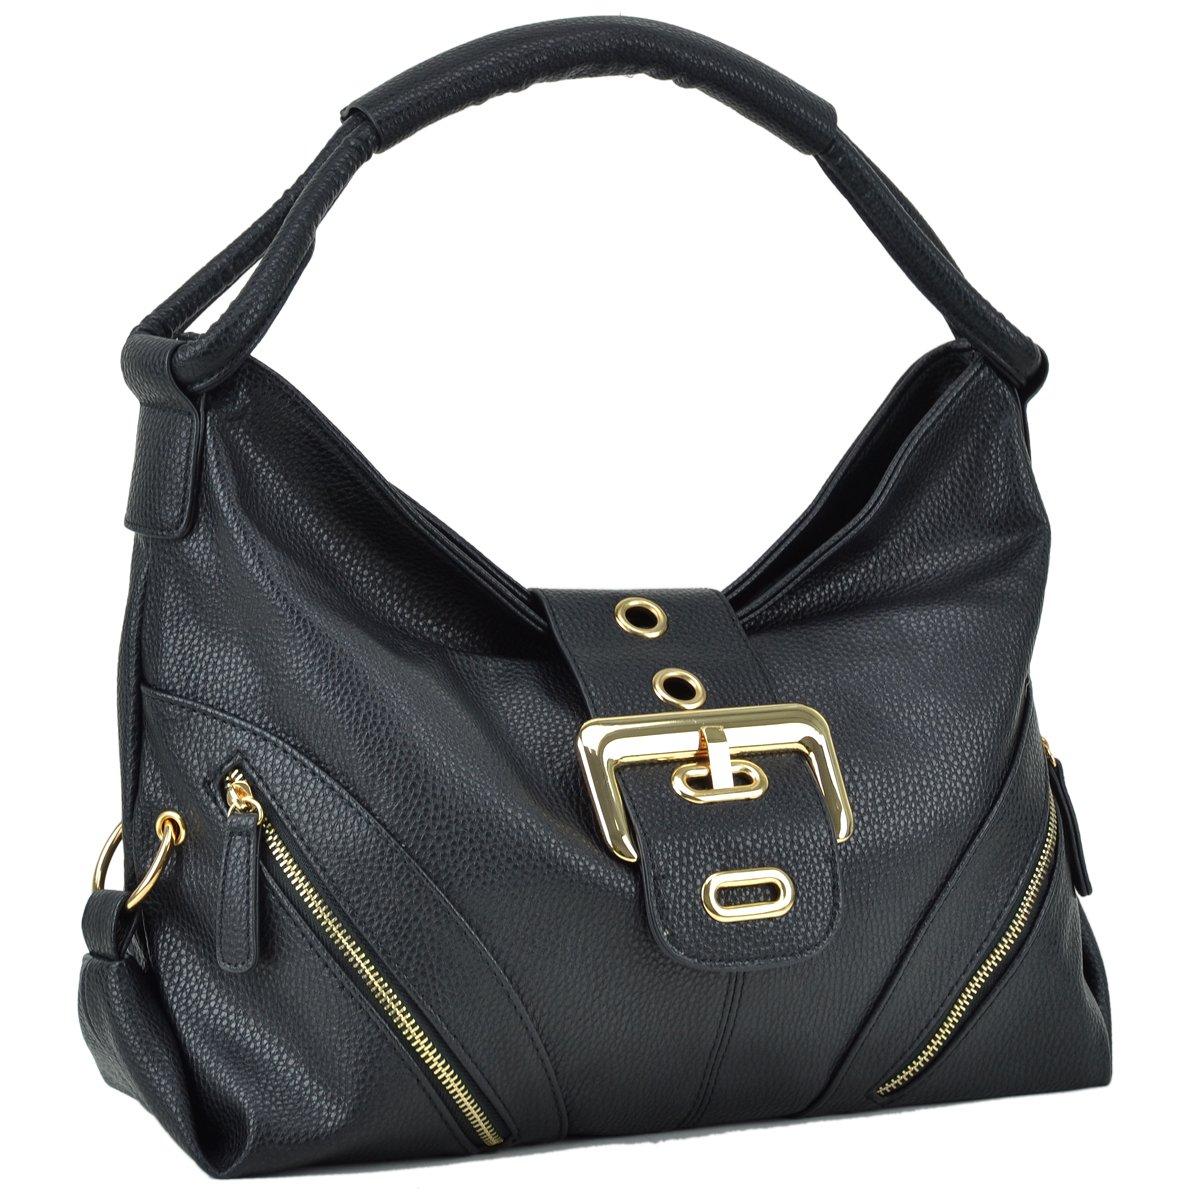 Dasein Womens Shoulder Bag Buckled Flap Handbag for Woman Top Handle Purse Designer Fashion Hobo Bag